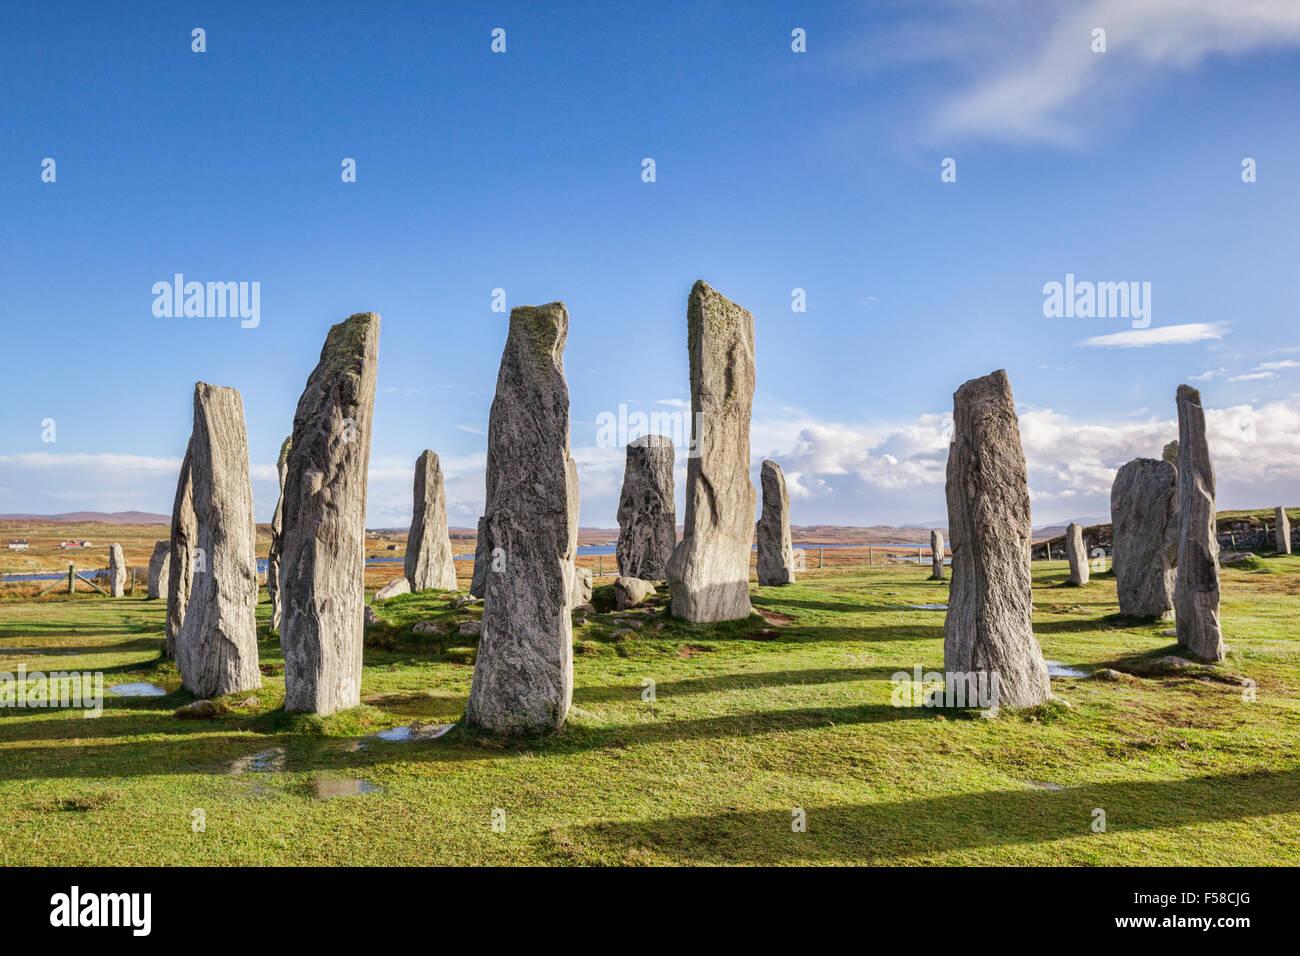 Stone Circle à Callanish, Isle Of Lewis, Western Isles, îles Hébrides, Ecosse, Royaume-Uni Photo Stock